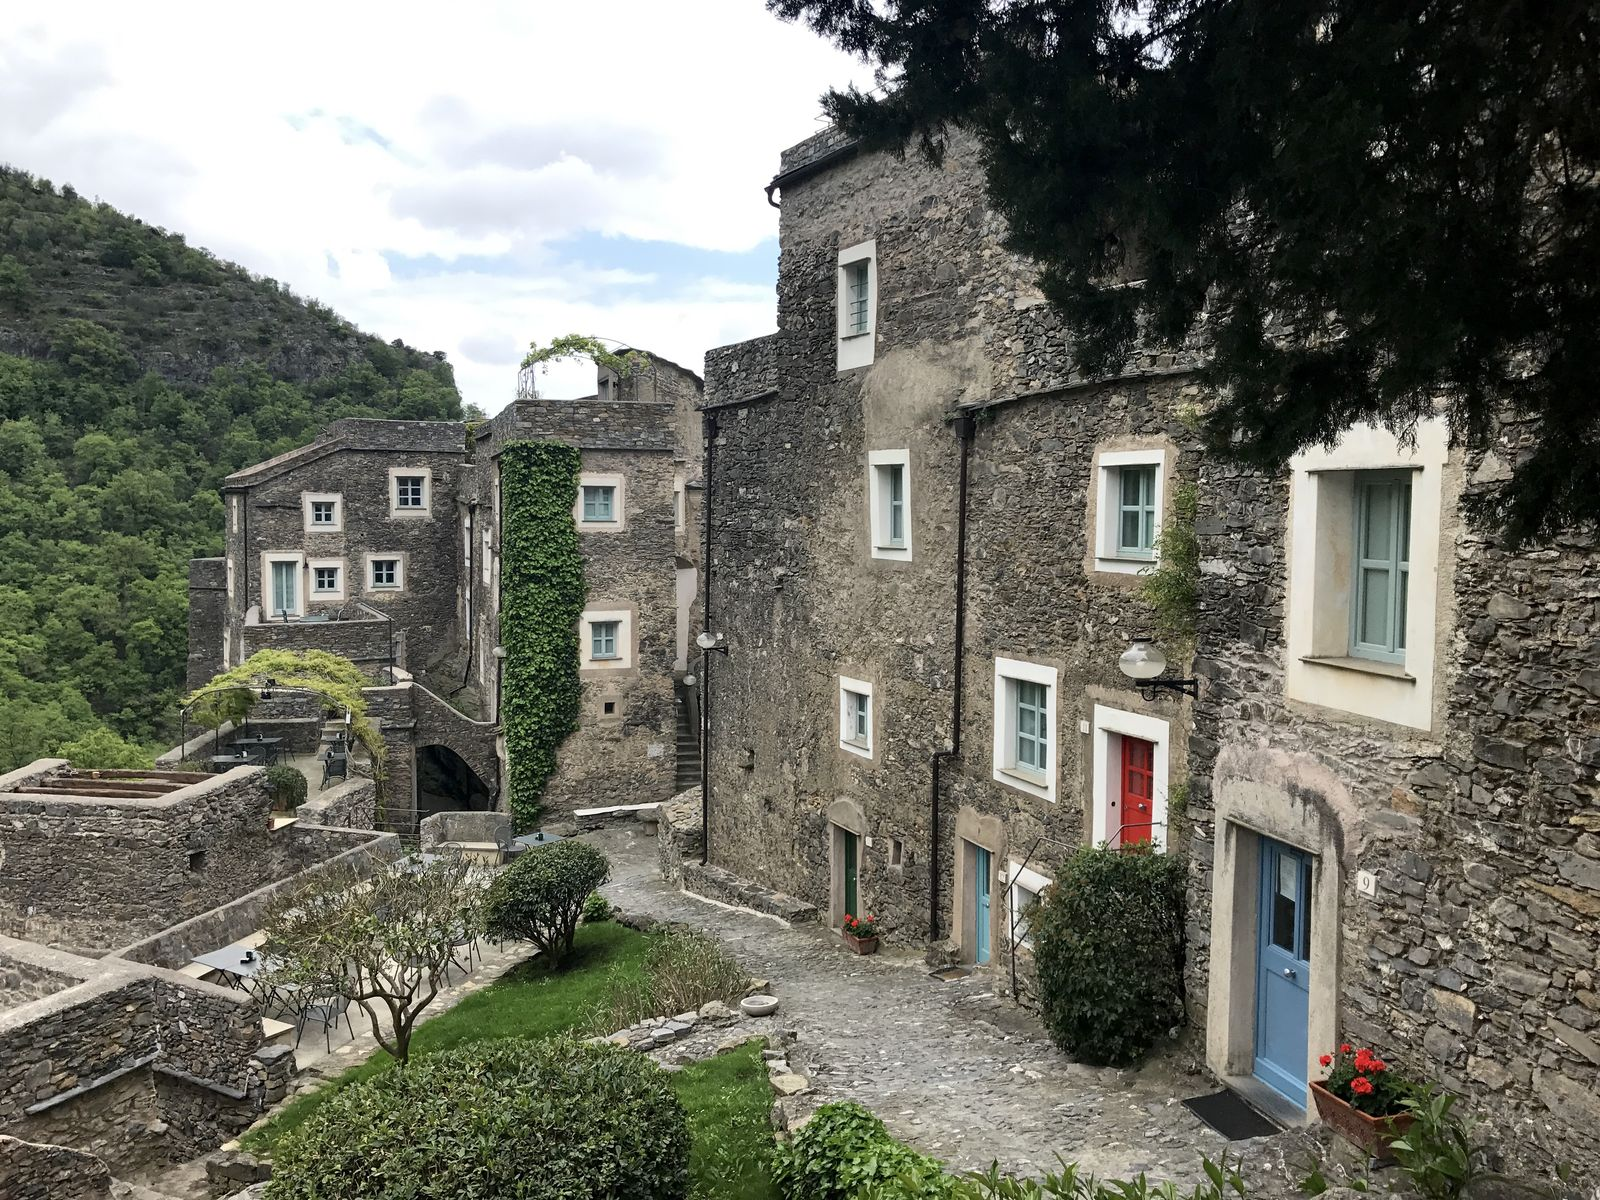 borgo di Castelbianco in Liguria